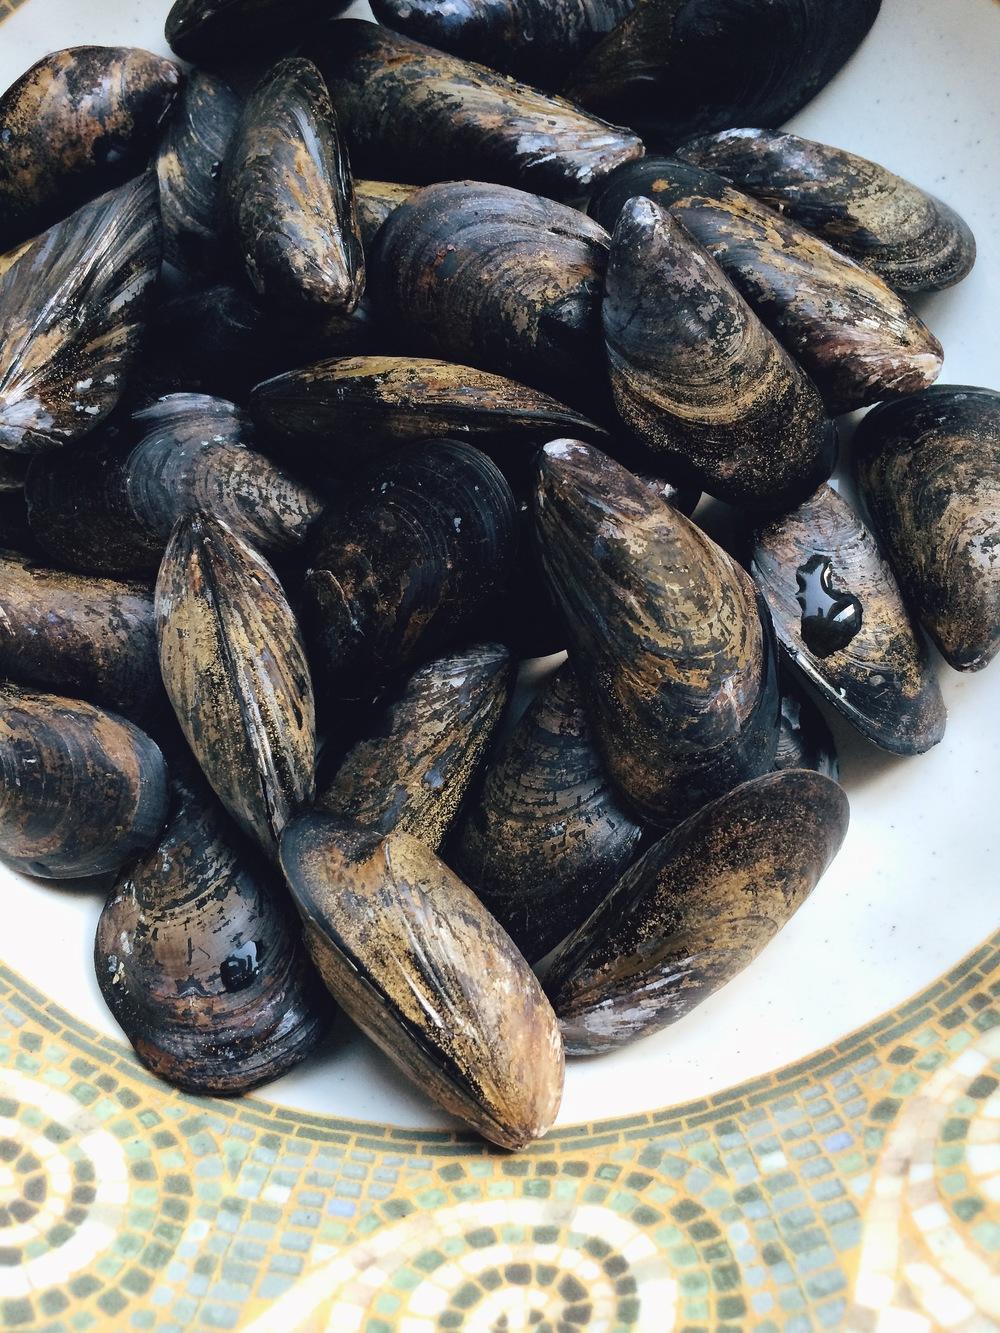 Mussels #foodbymars